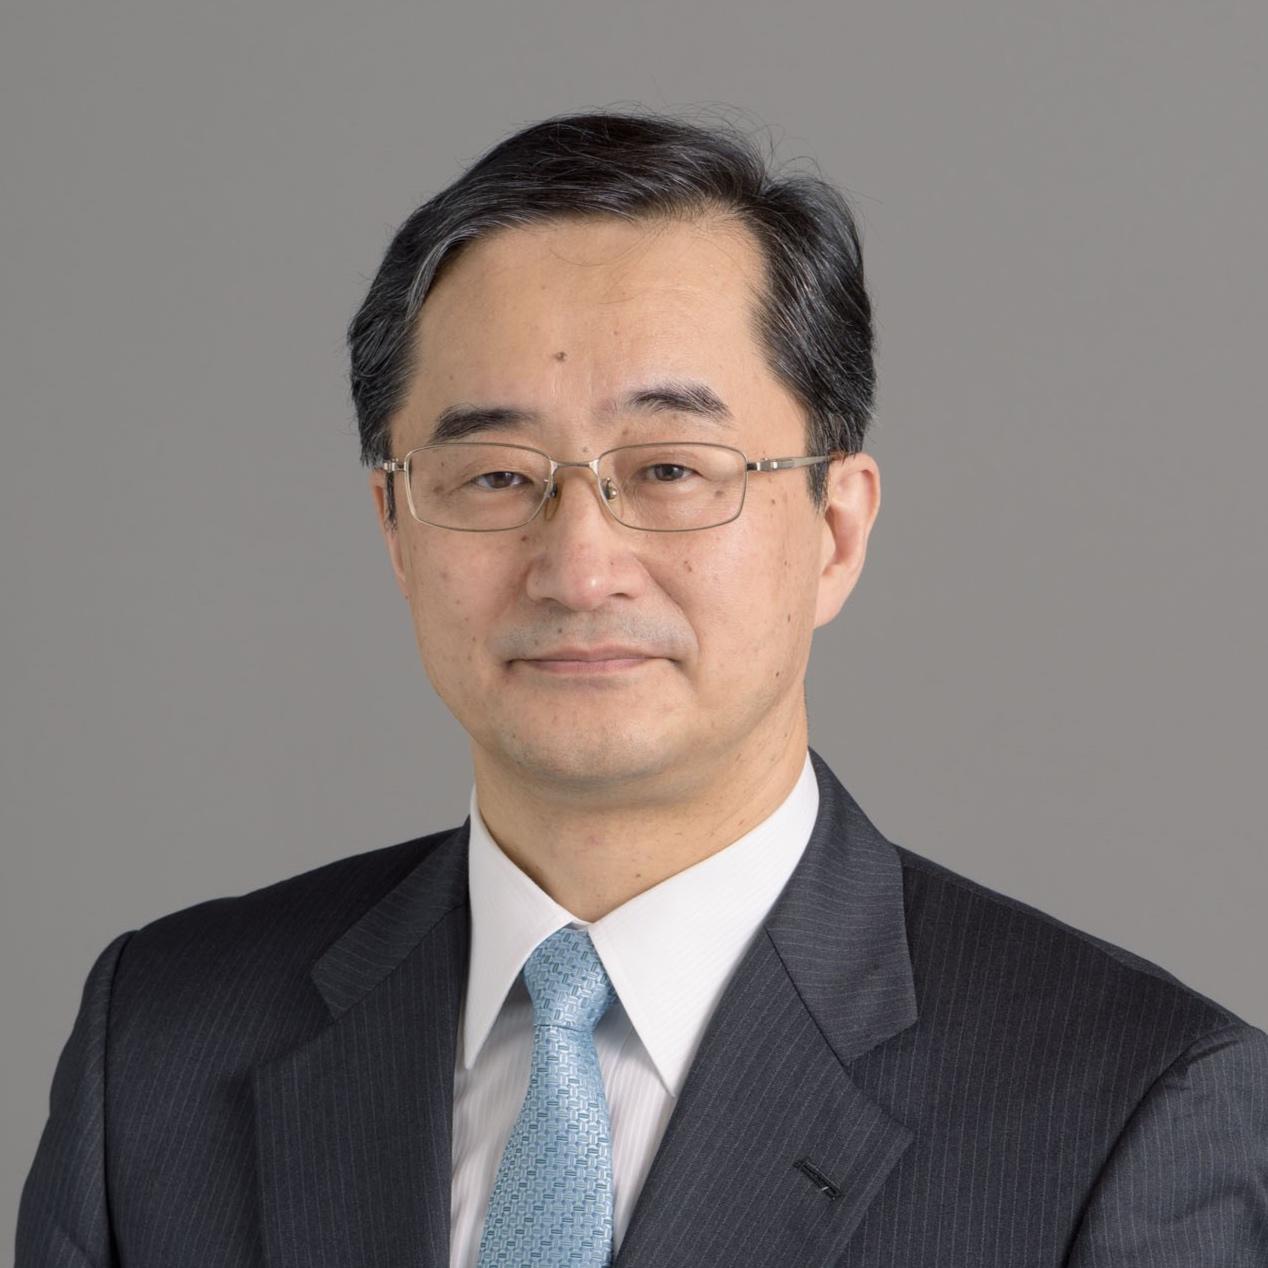 fukunariFUKUNARI KIMURA PhD CHIEF ECONOMIST ECONOMIC RESEARCH INSTITUTE FOR ASEAN AND EAST ASIA (ERIA)_eu-japan-forumjpg